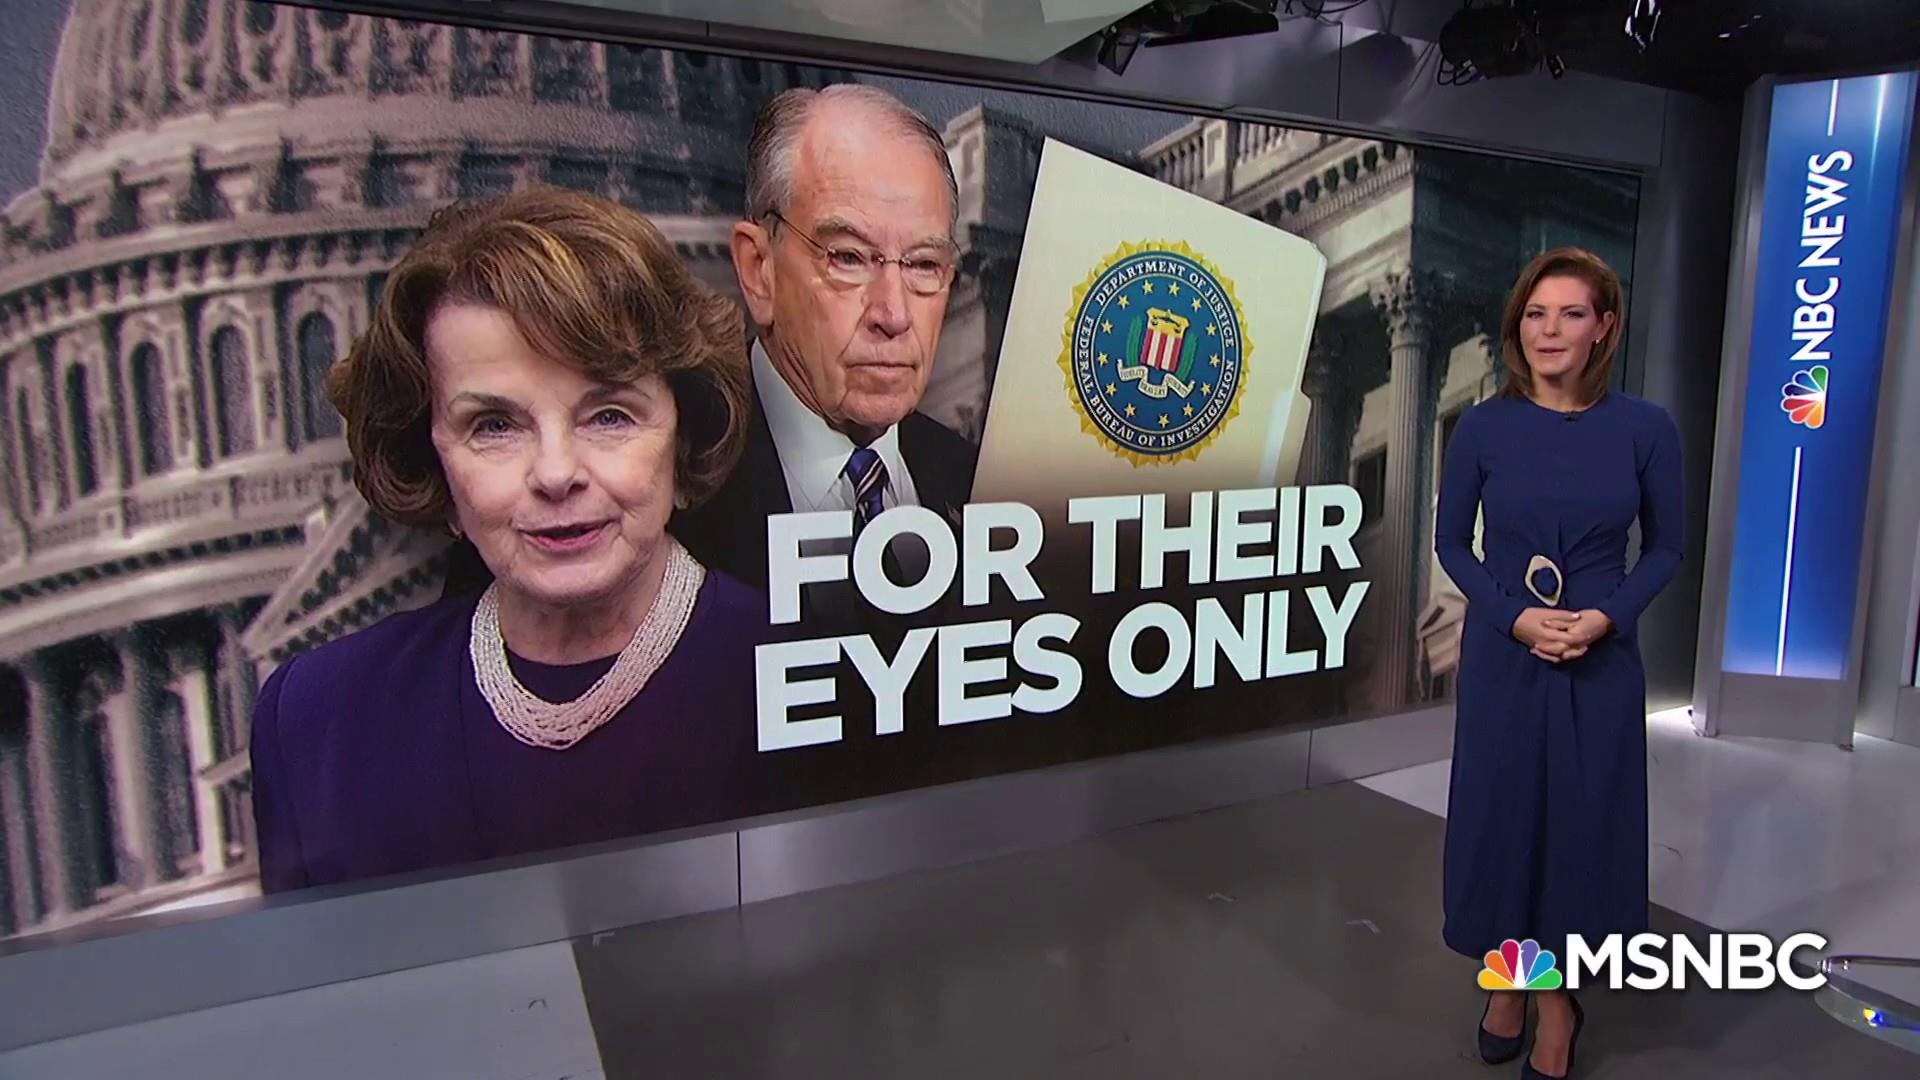 Senators begin reviewing Kavanaugh FBI report behind closed doors